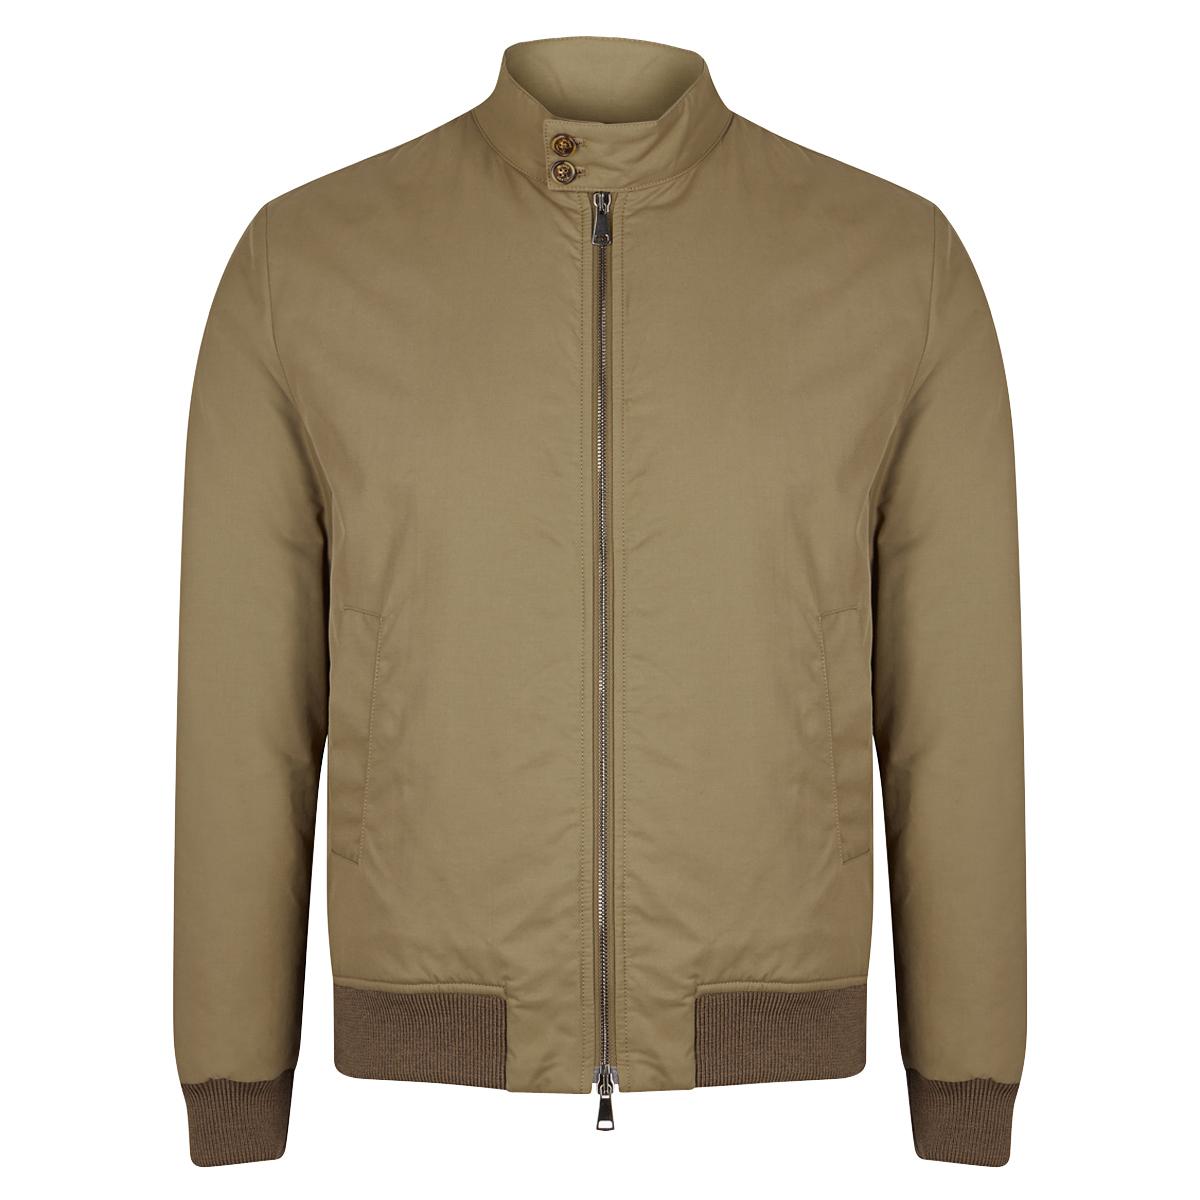 WR Cotton Blend Padded Zip Jacket Beige